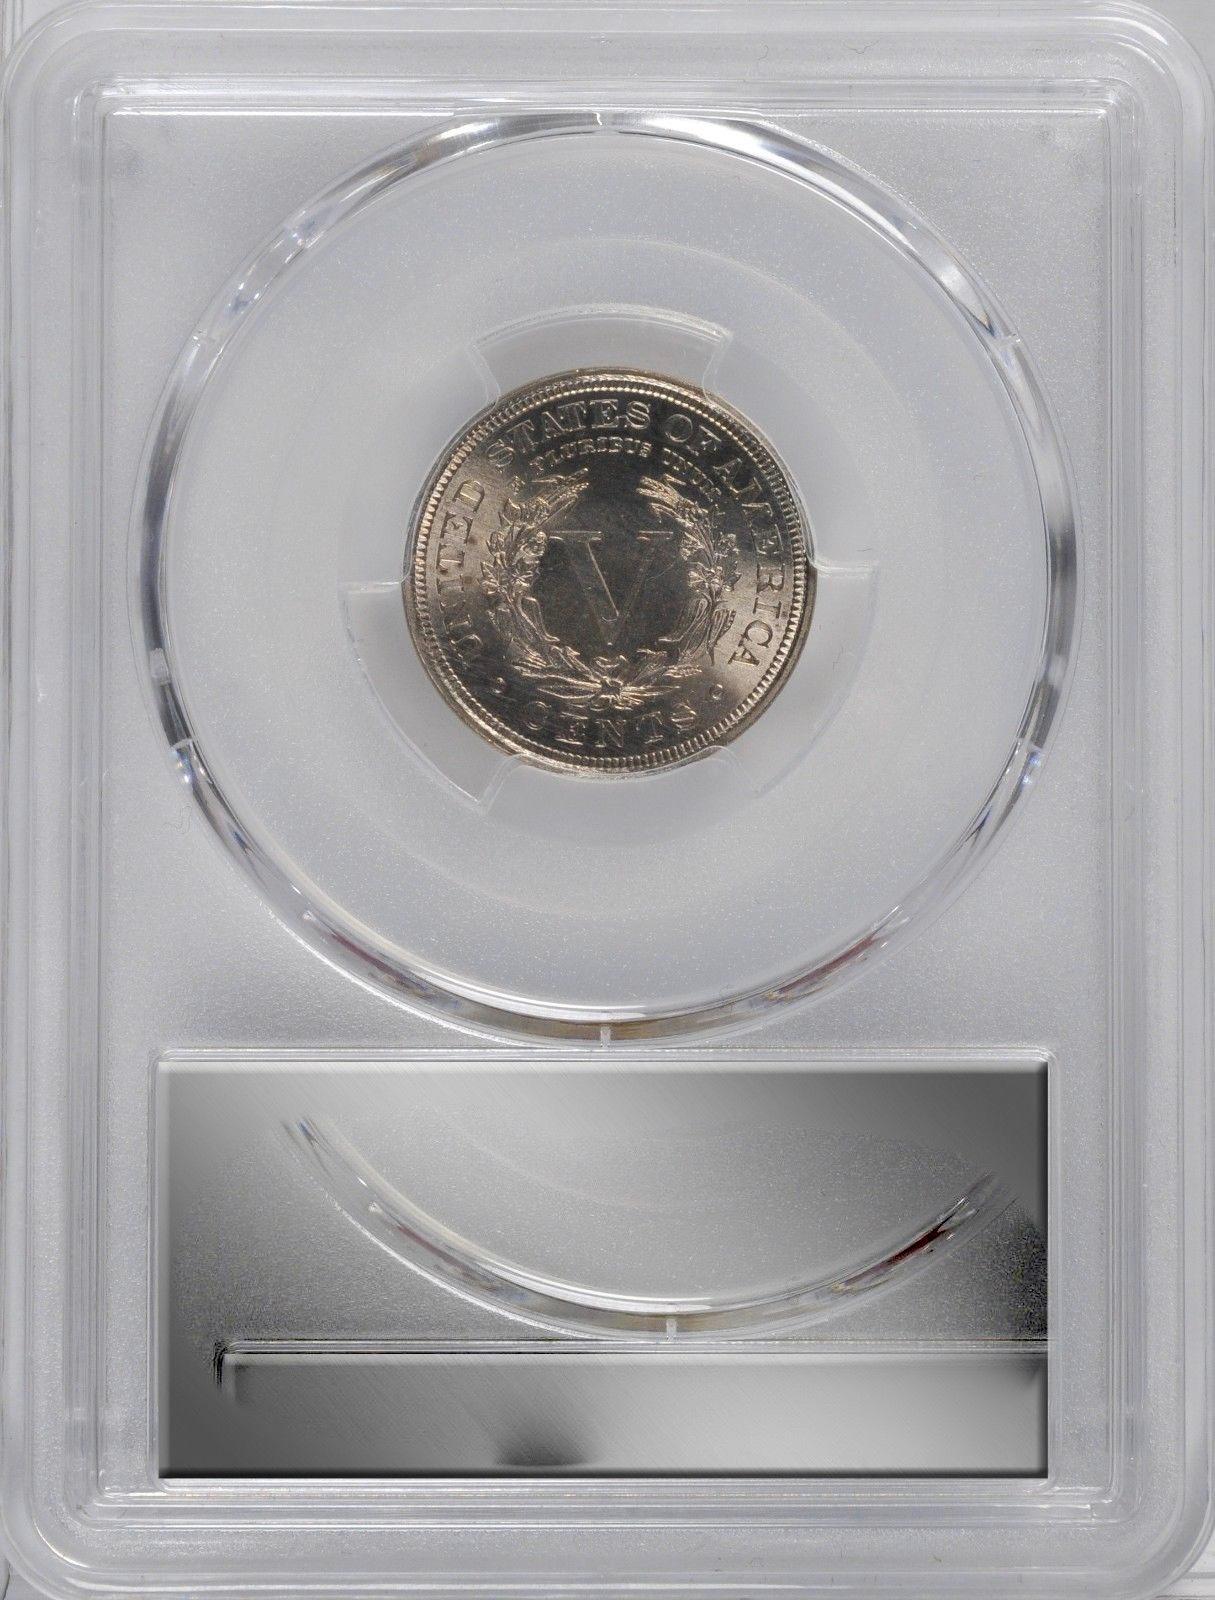 1900 Liberty Head Nickel - PCGS MS-66  - Mint State 66 - V Nickel image 5